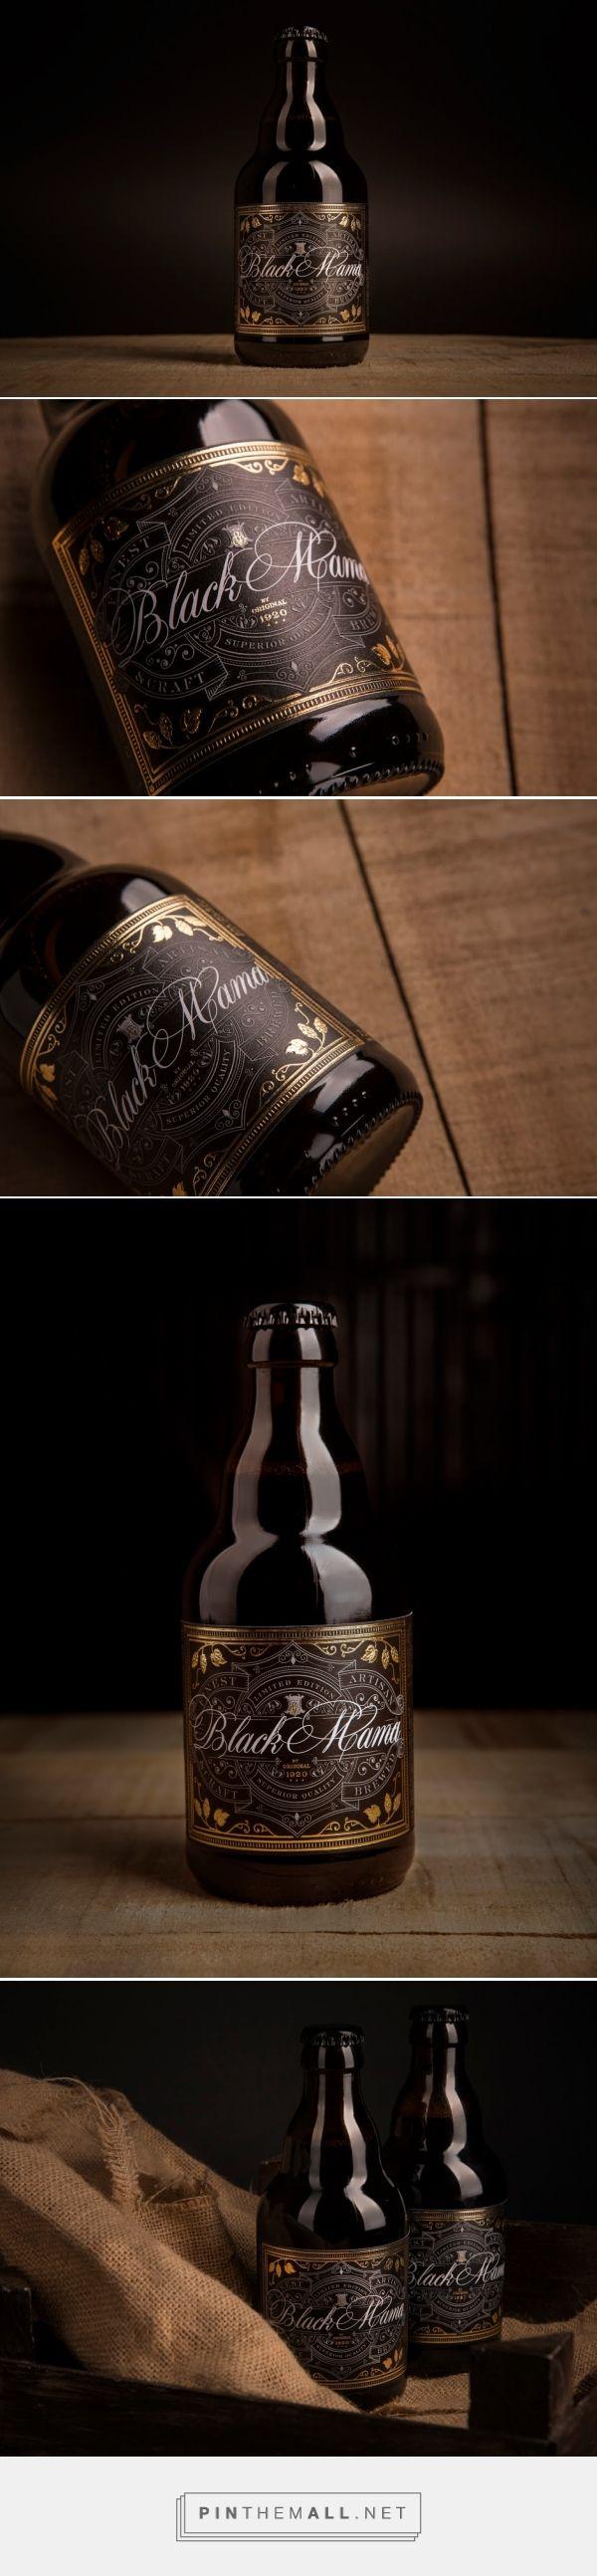 Black Mama Craft Beer packaging design by Think Bold Studio (Portugal) - http://www.packagingoftheworld.com/2016/05/black-mama-craft-beer.html